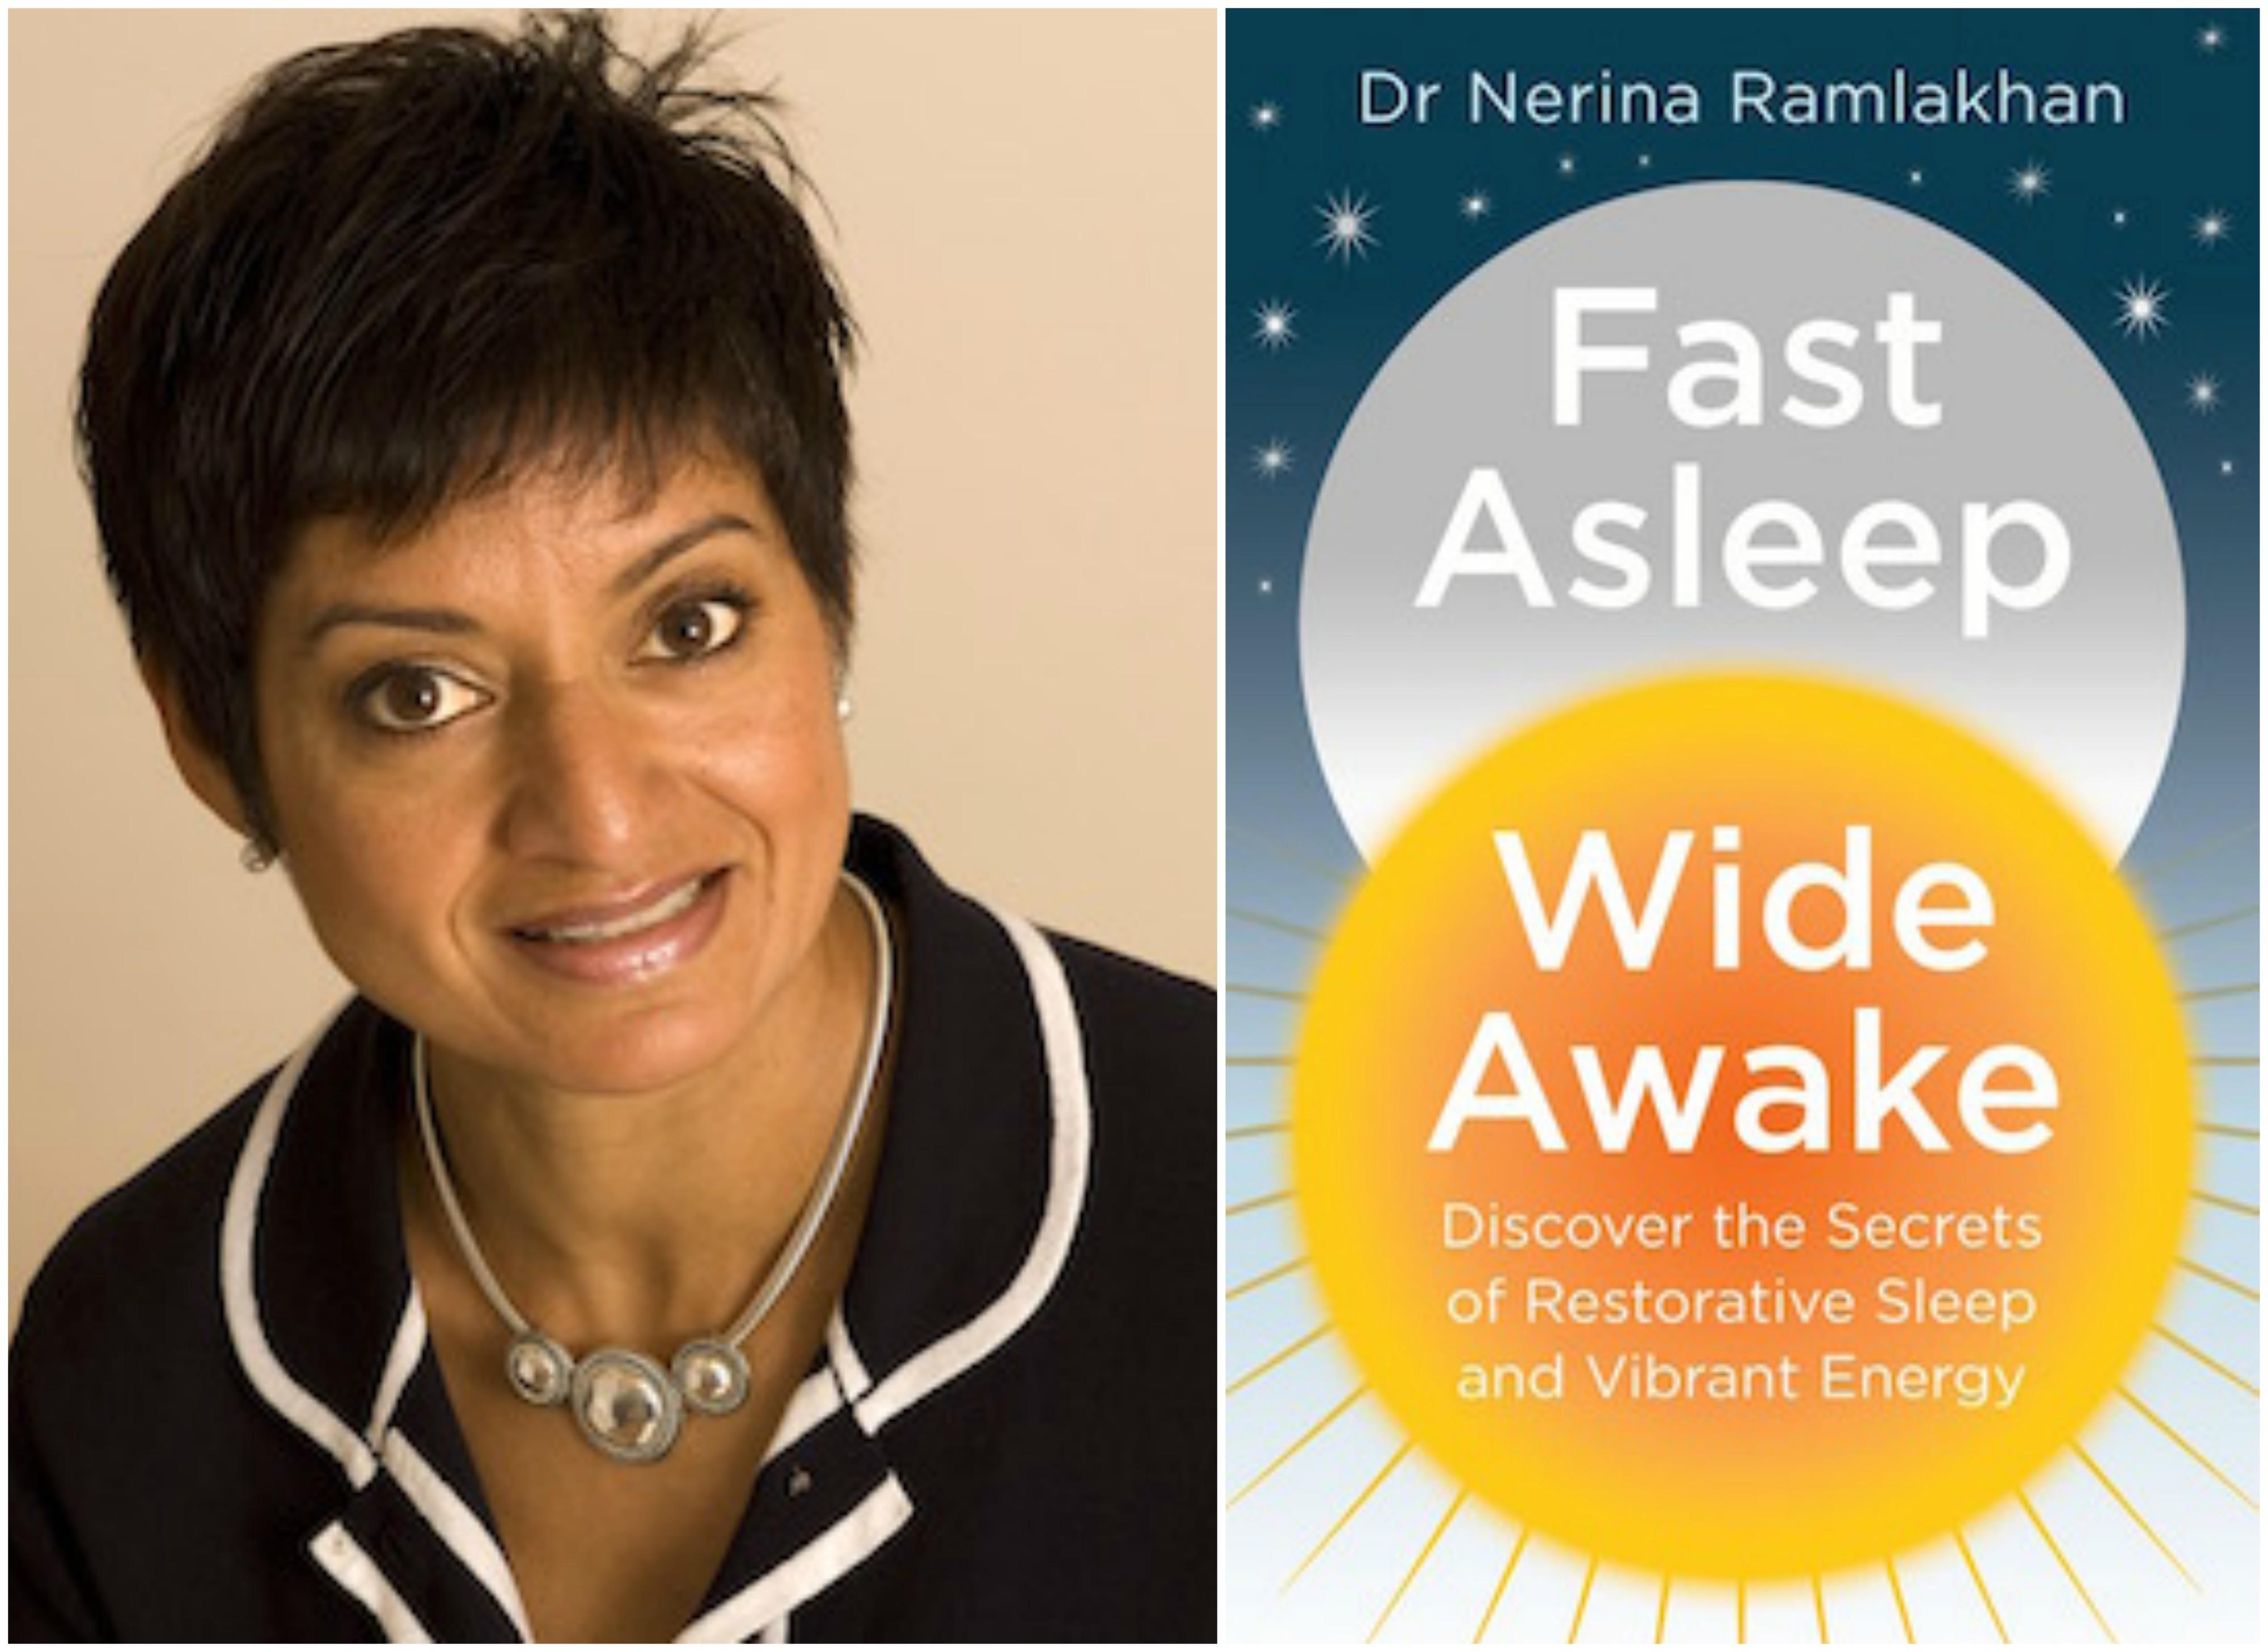 fast asleep wide awake, dr nerina ramlakhan, how sleep perfectionism is keeping you awake, by healthista.com